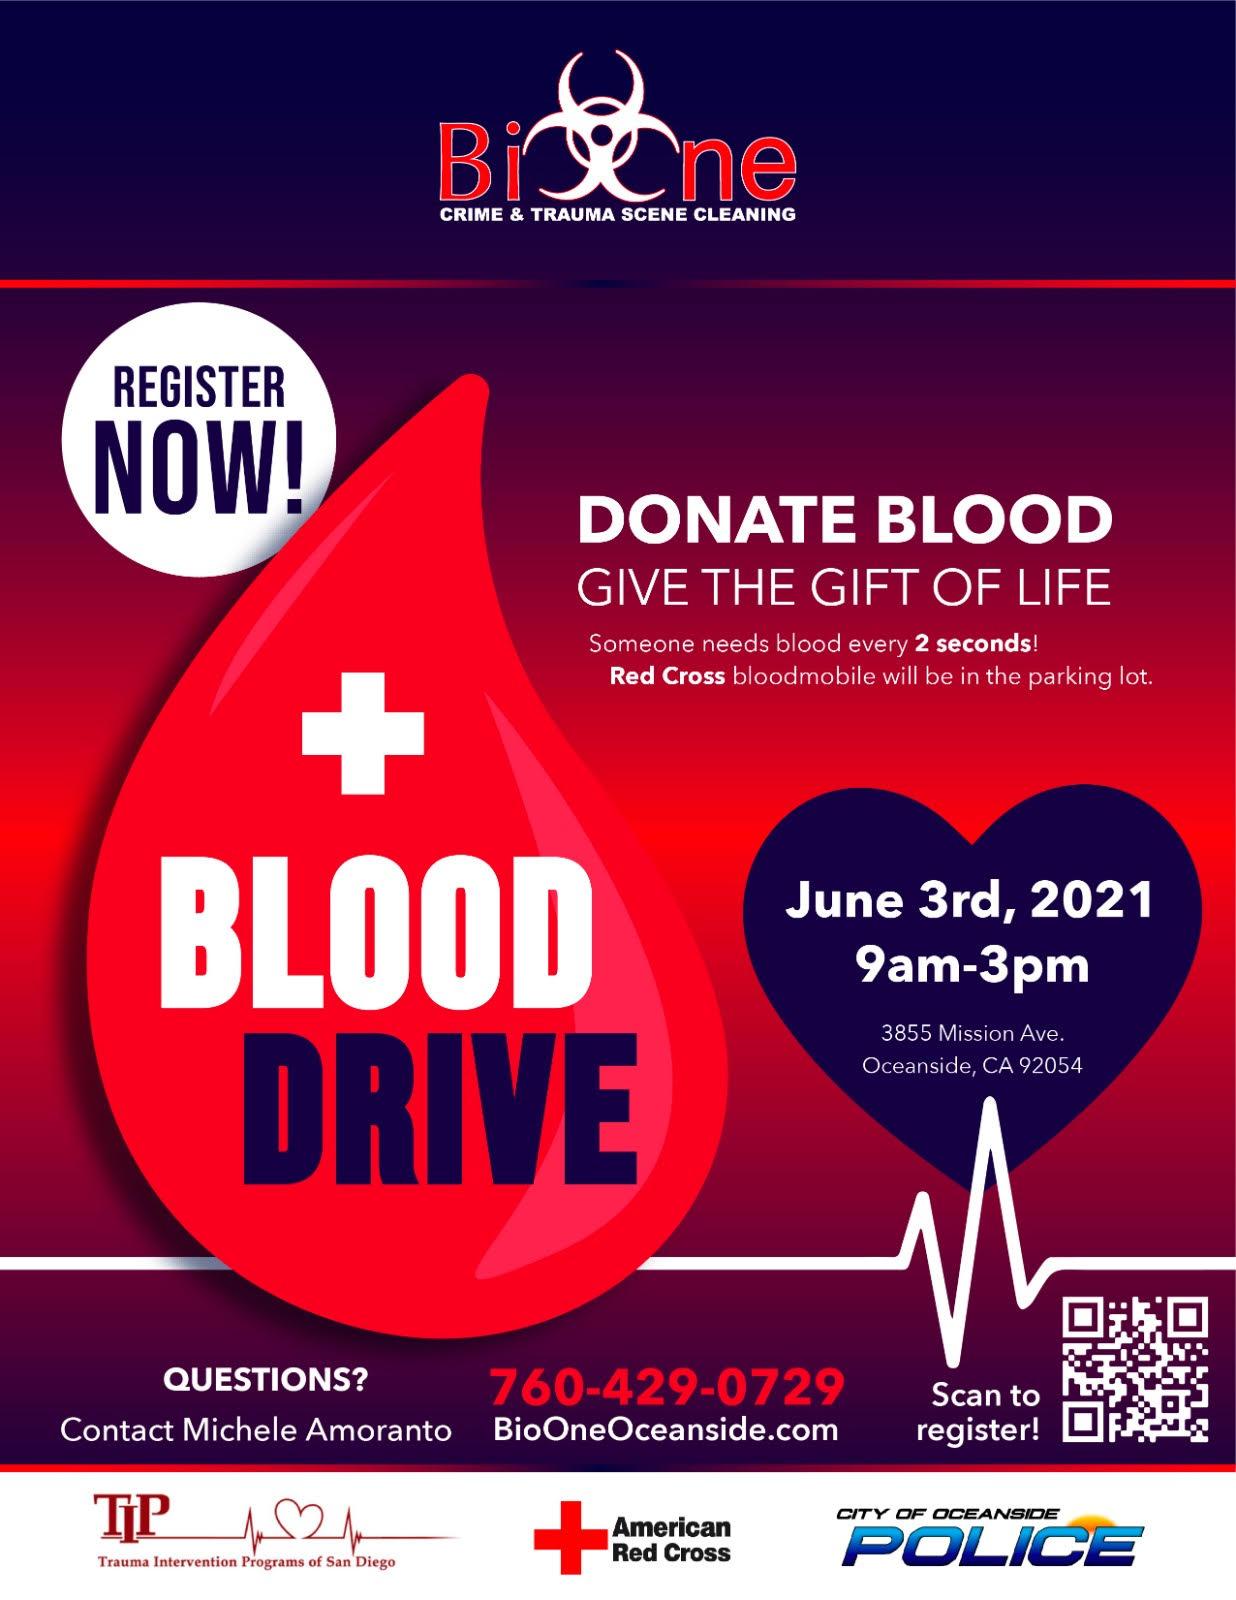 American Red Cross Blood Drive Registration